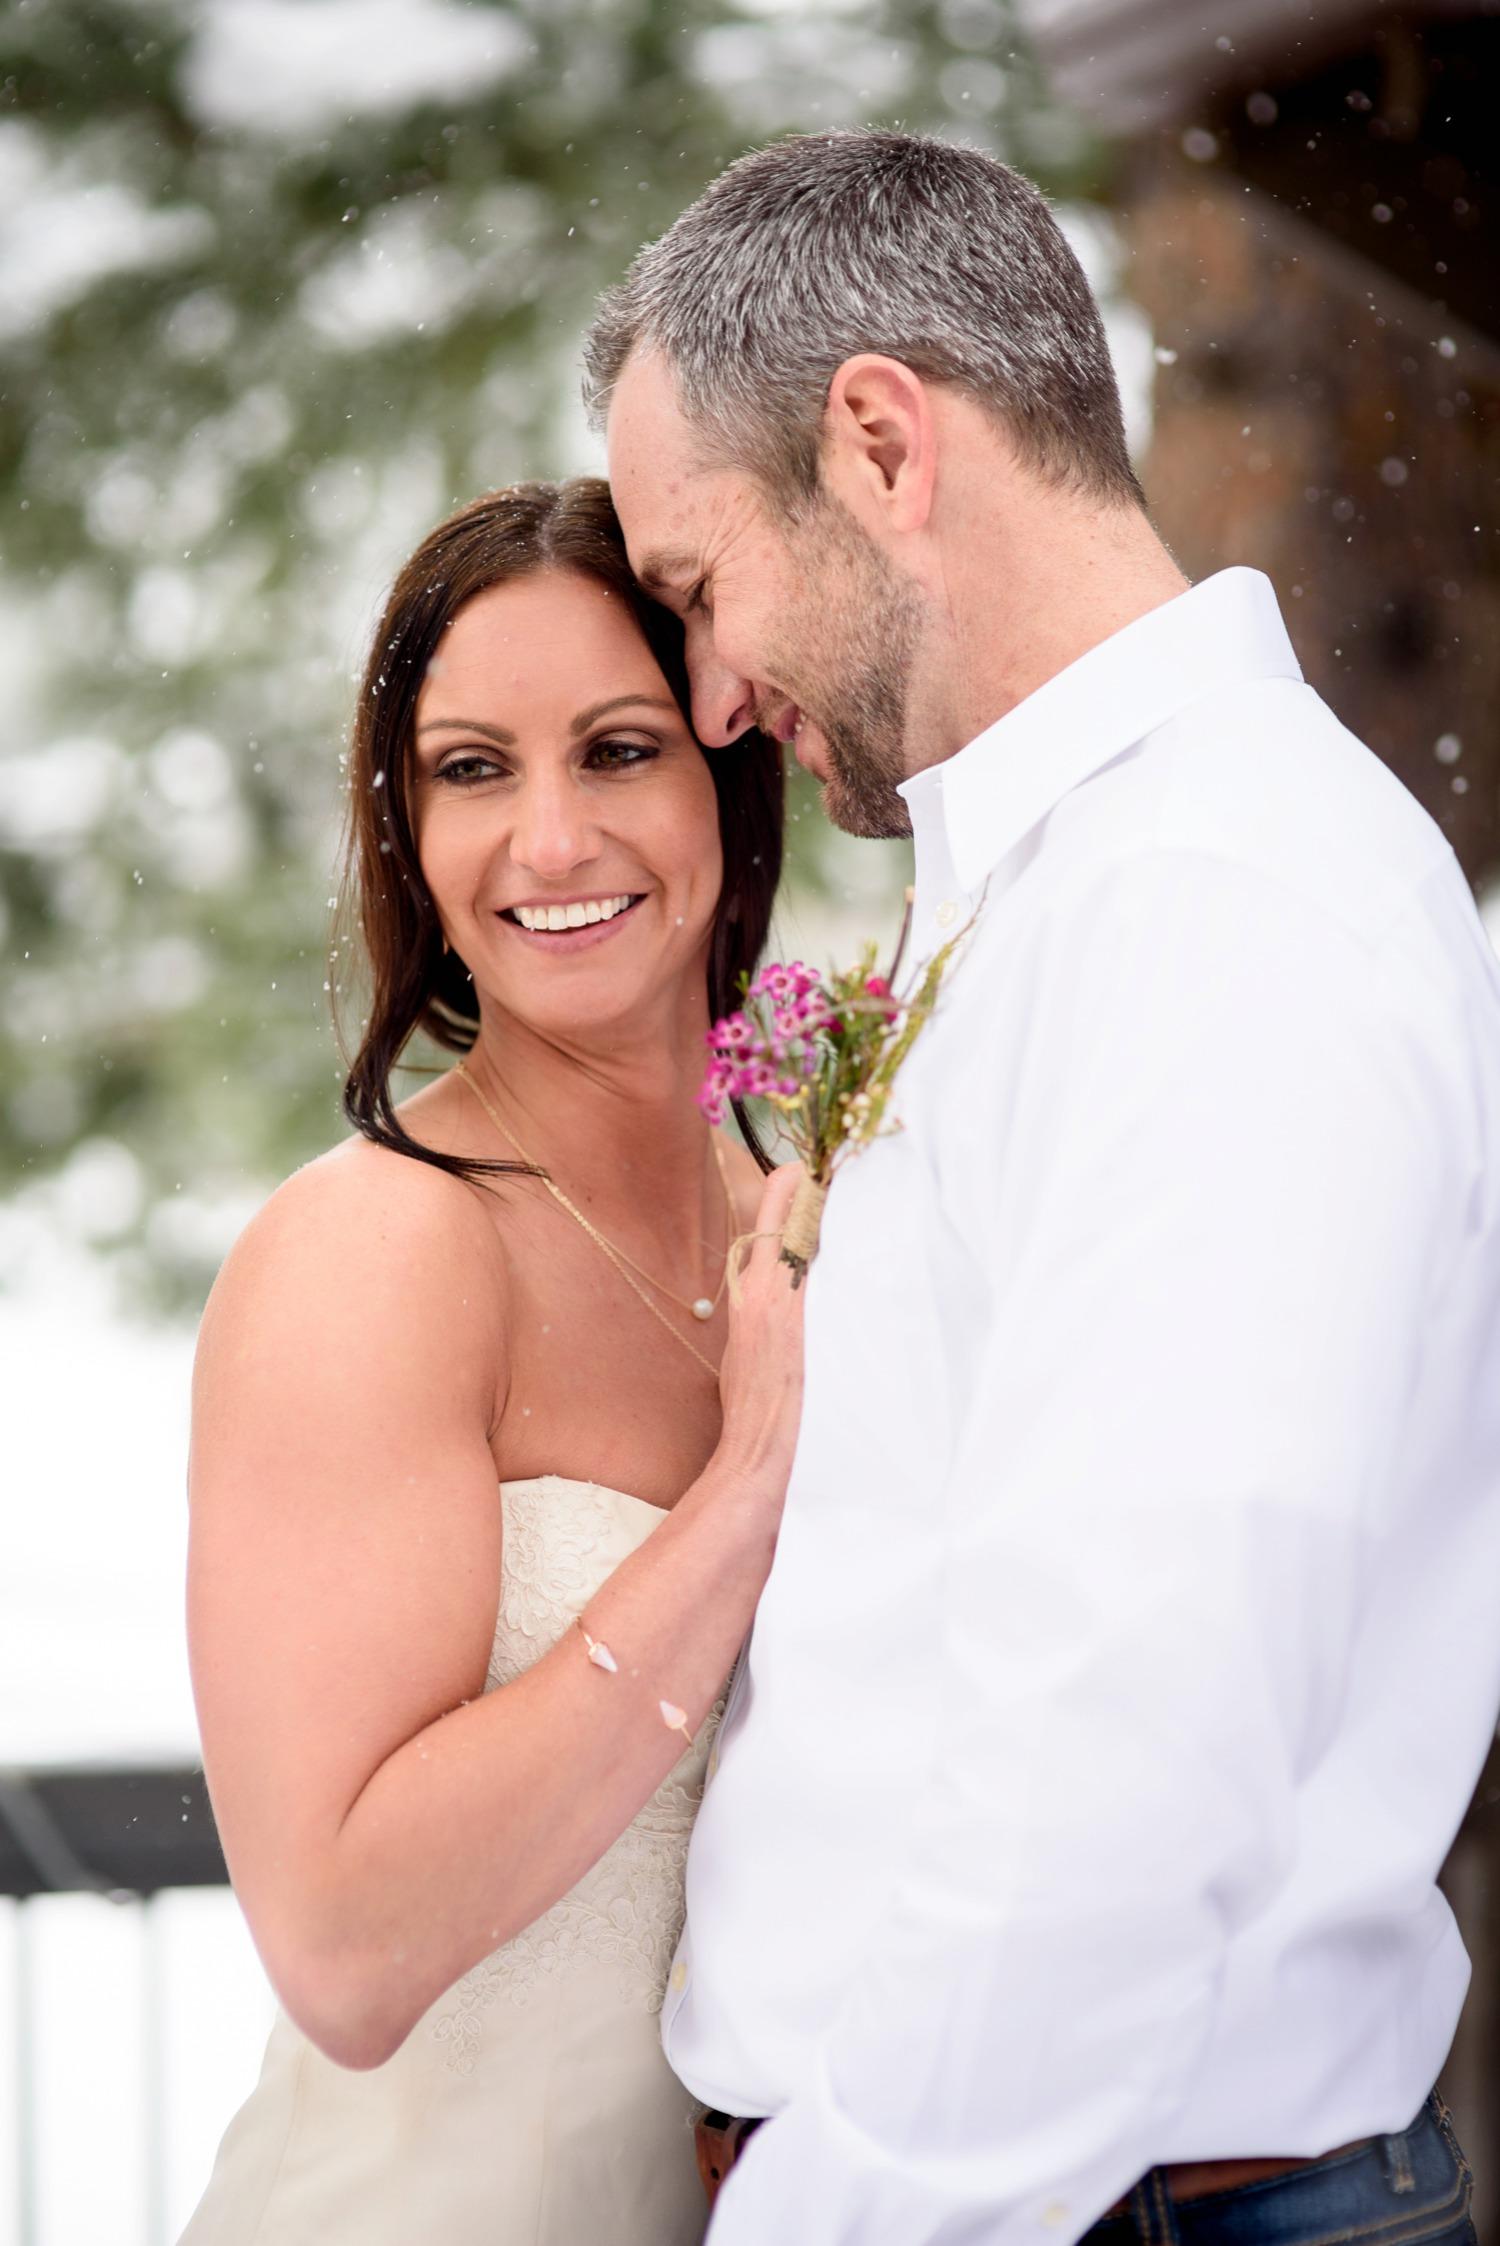 Evergreen-mountain-winter-wedding-photography_0030.jpg